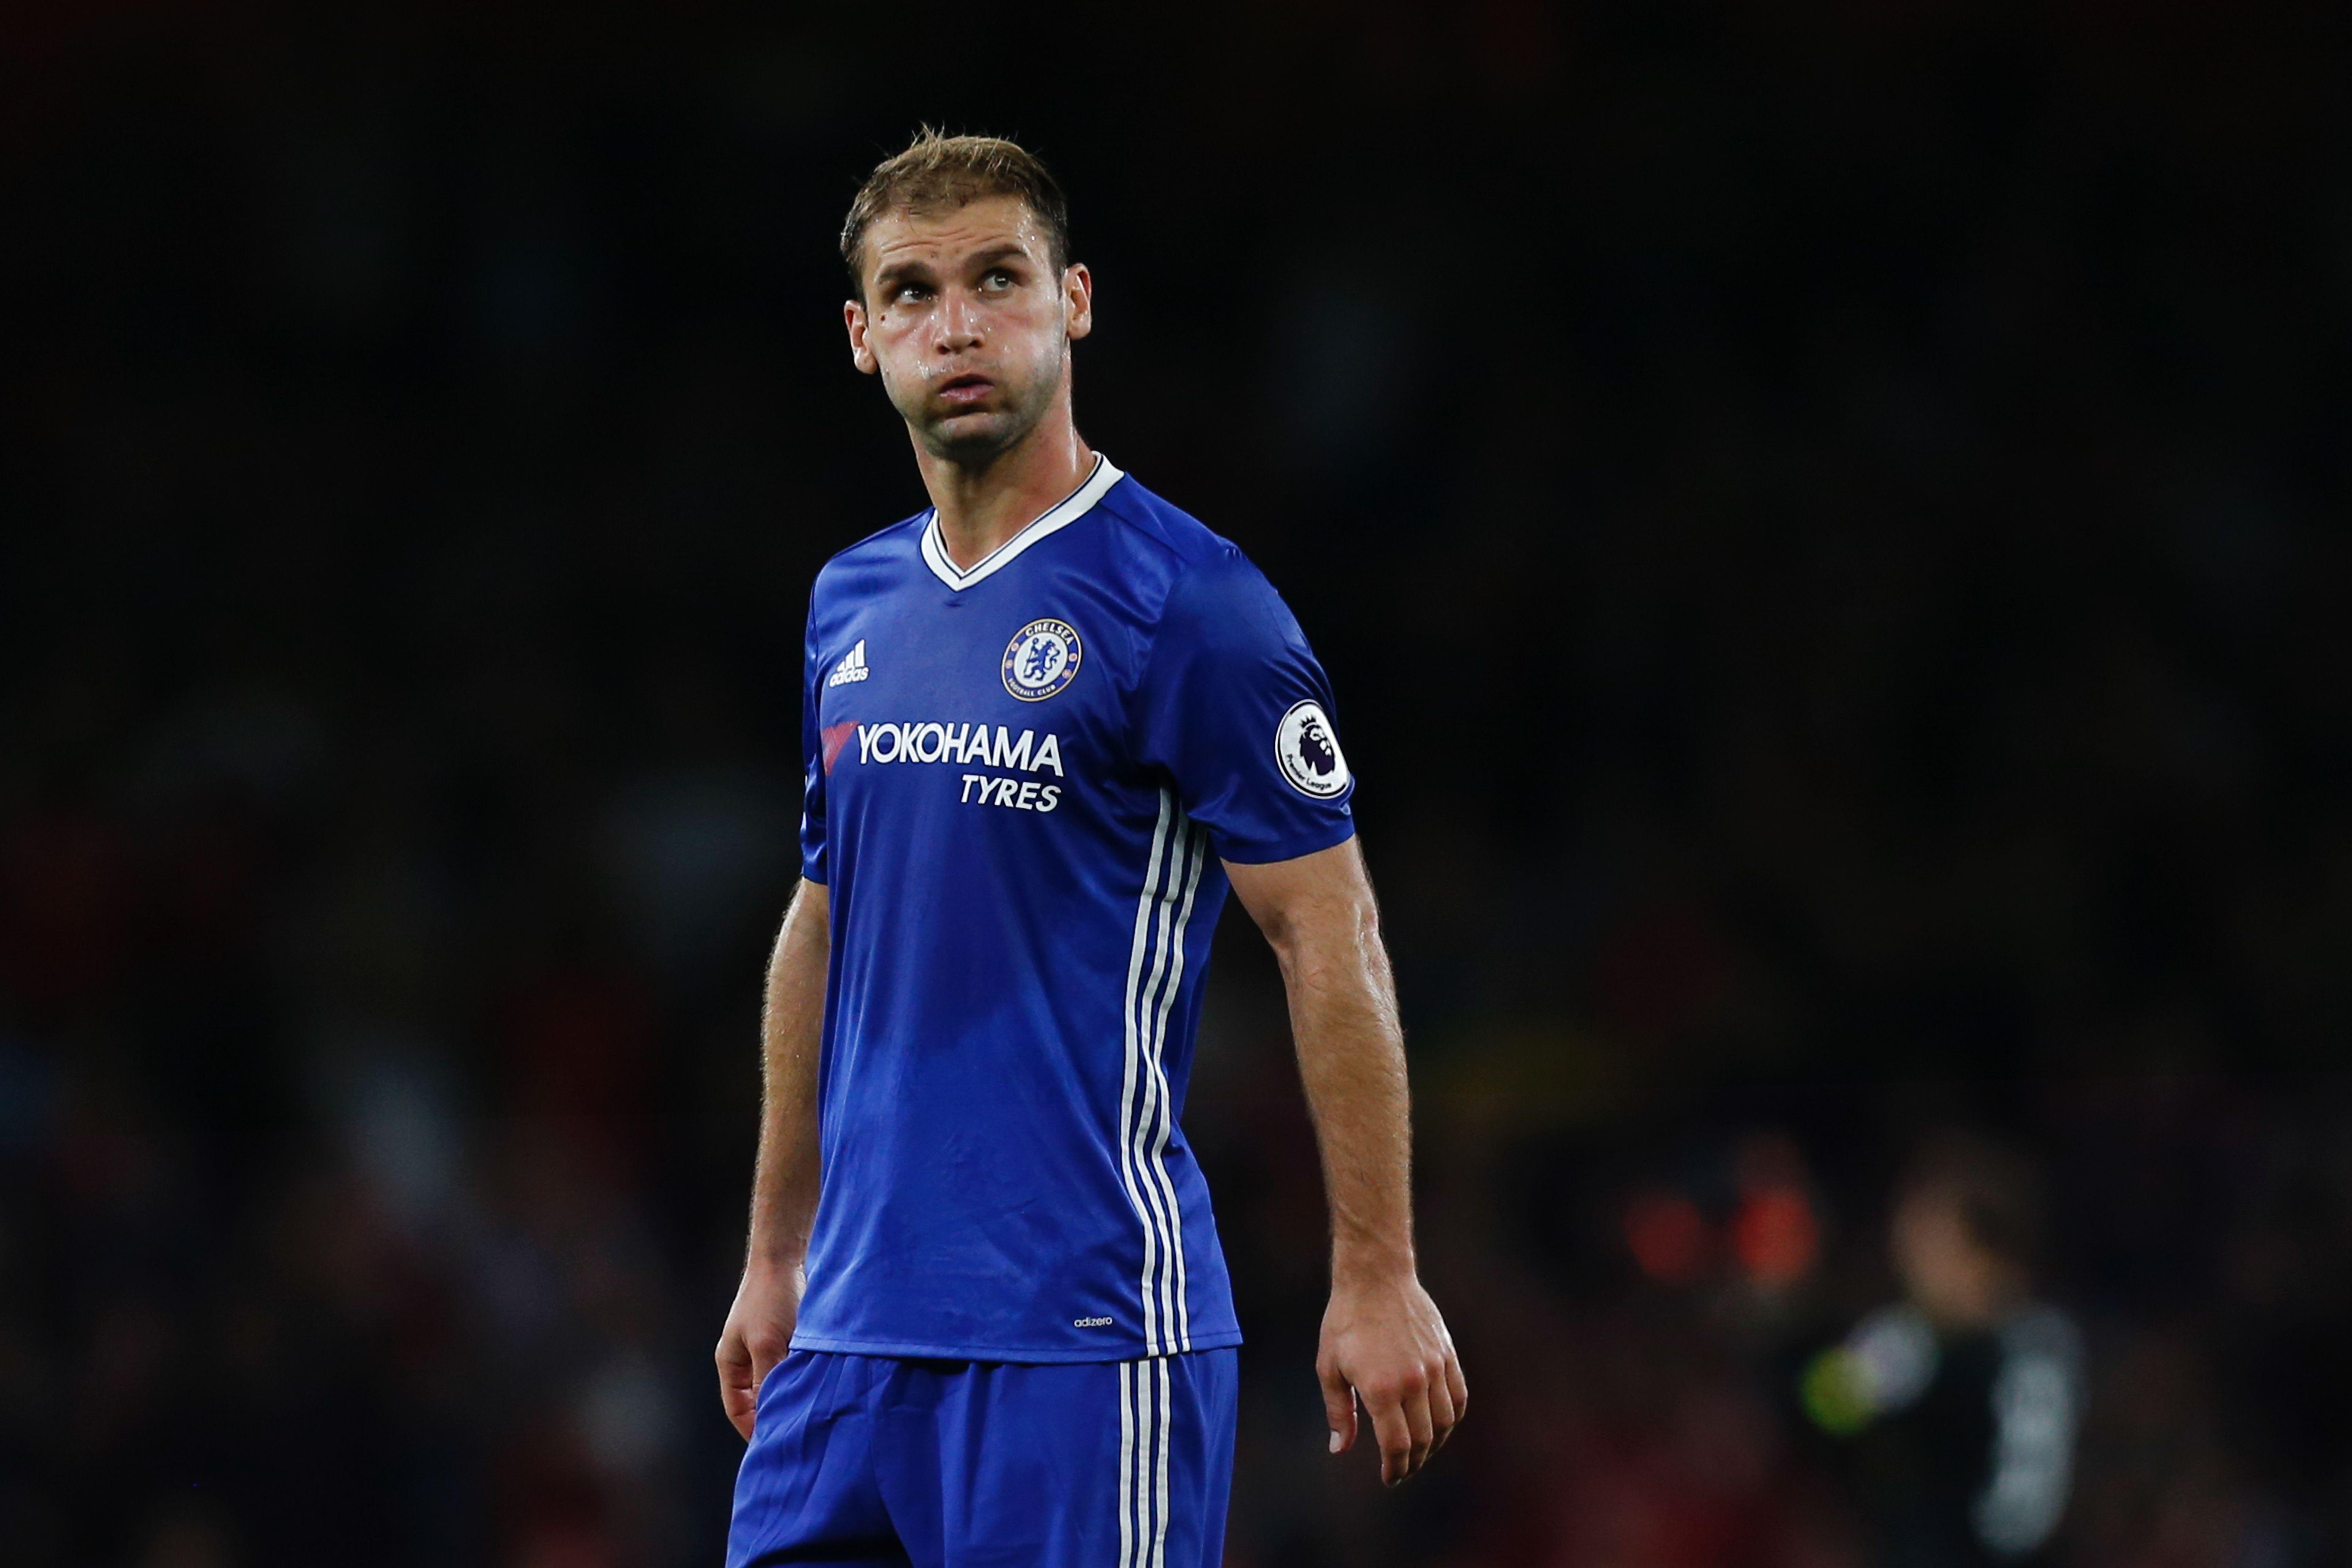 Chelsea's Branislav Ivanovic travels to Spain to complete Zenit transfer